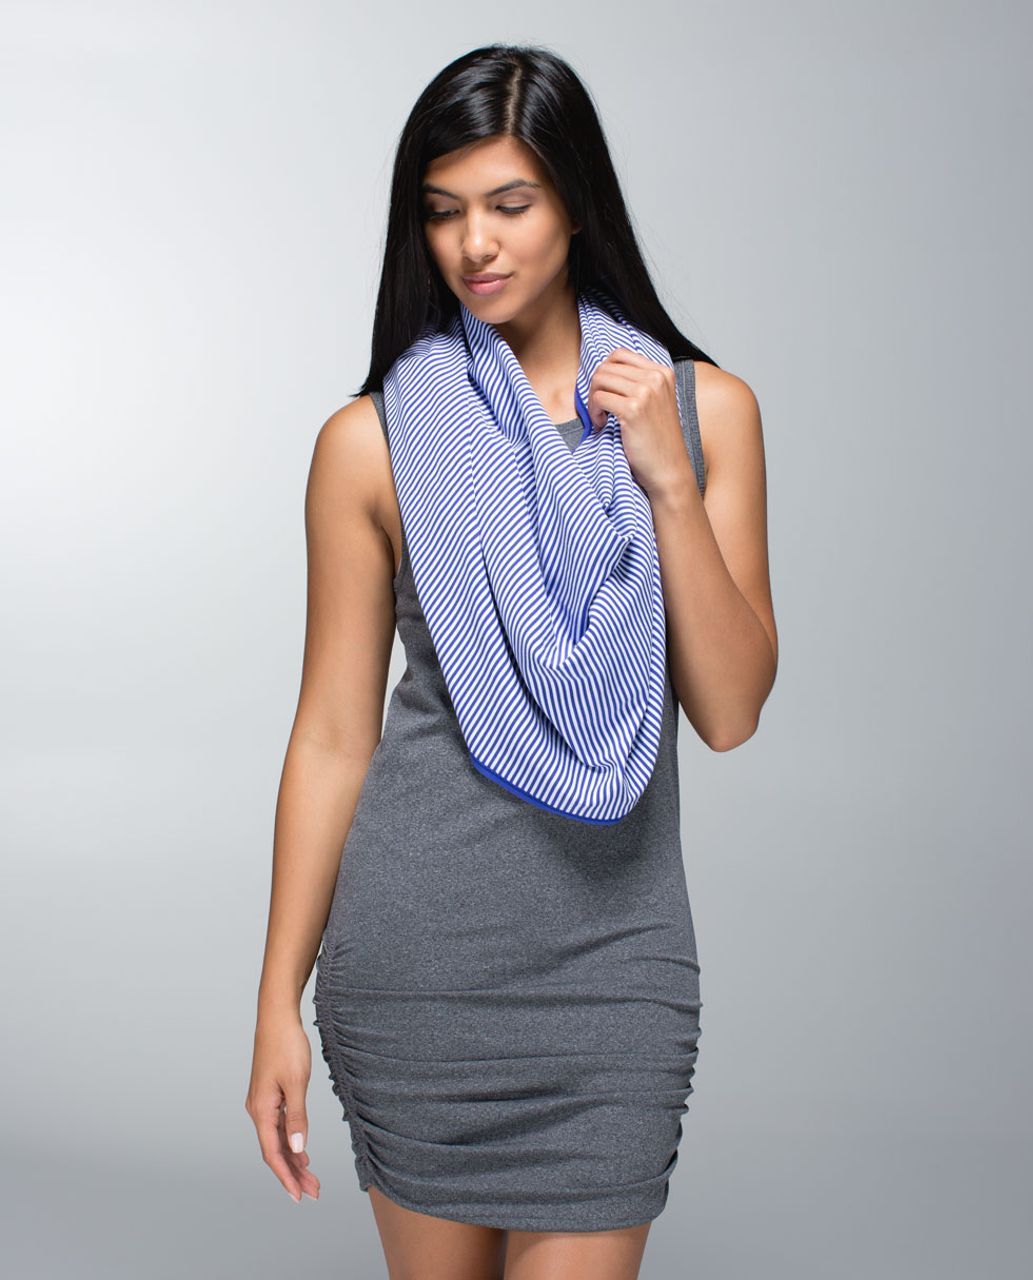 Lululemon Vinyasa Scarf *Rulu - Pigment Blue / 1/8 Stripe Pigment Blue White